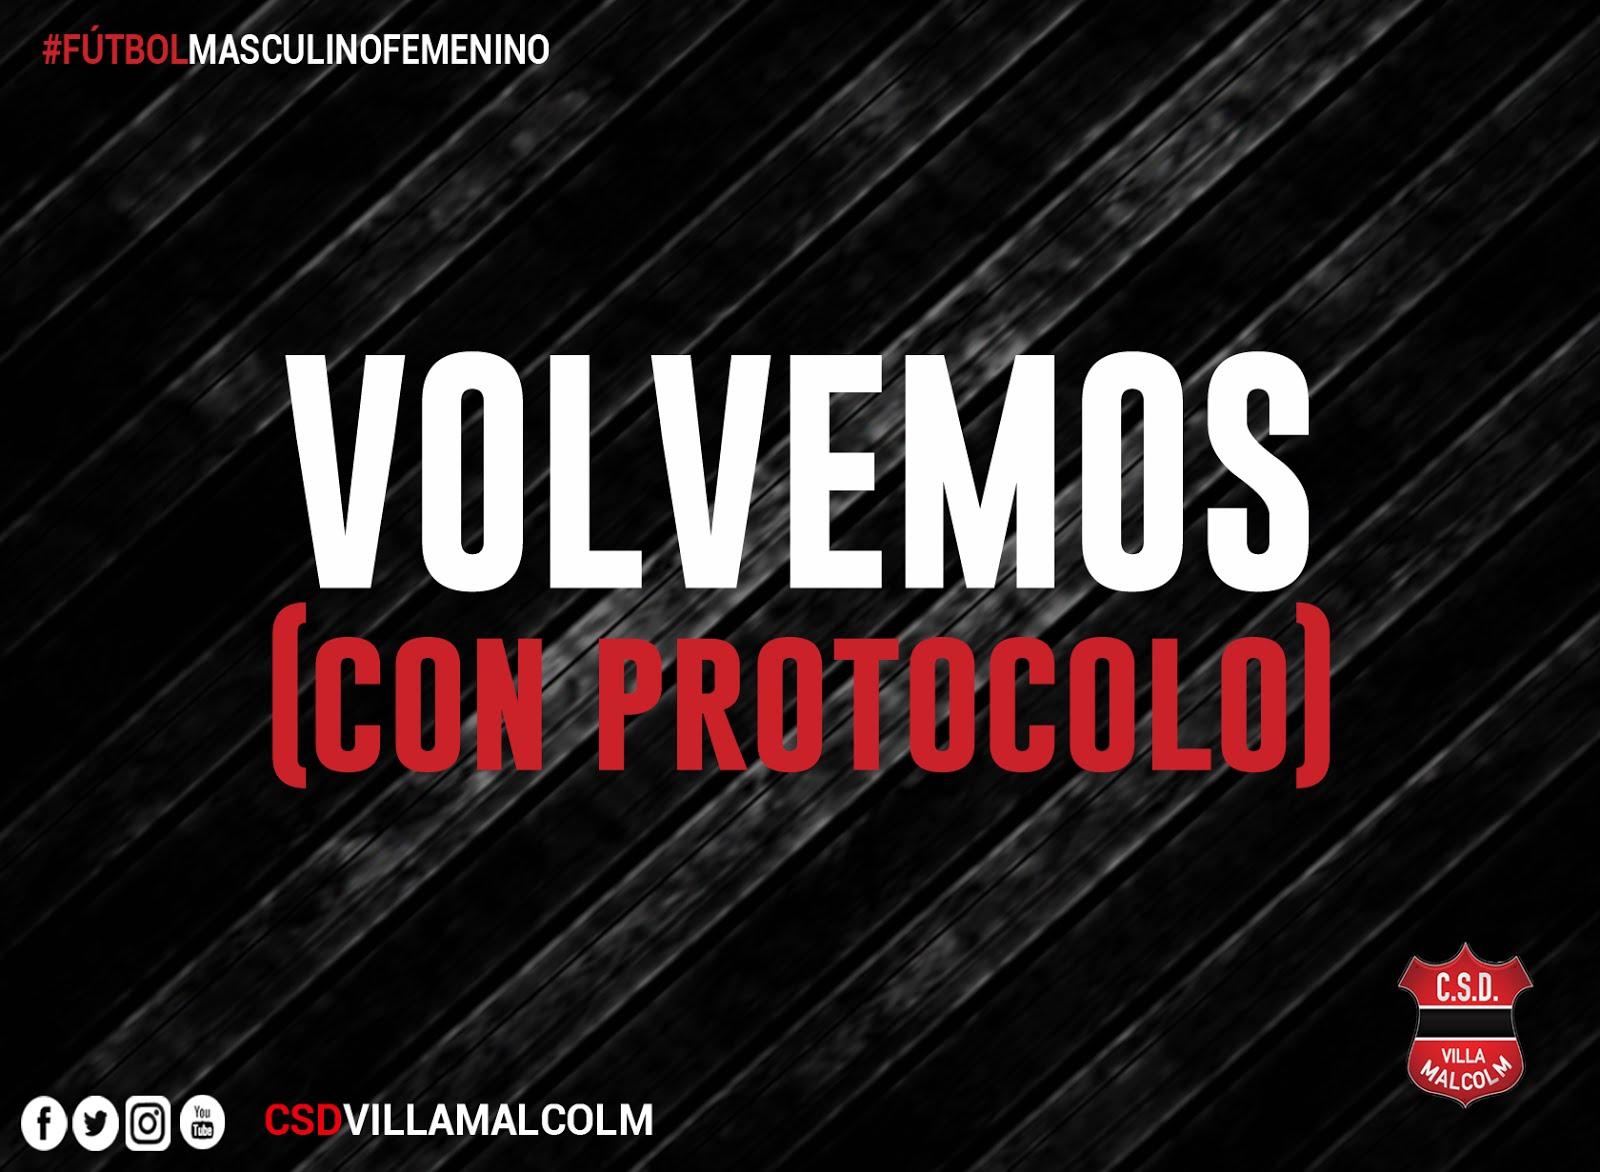 VOLVEMOS (CON PROTOCOLO)